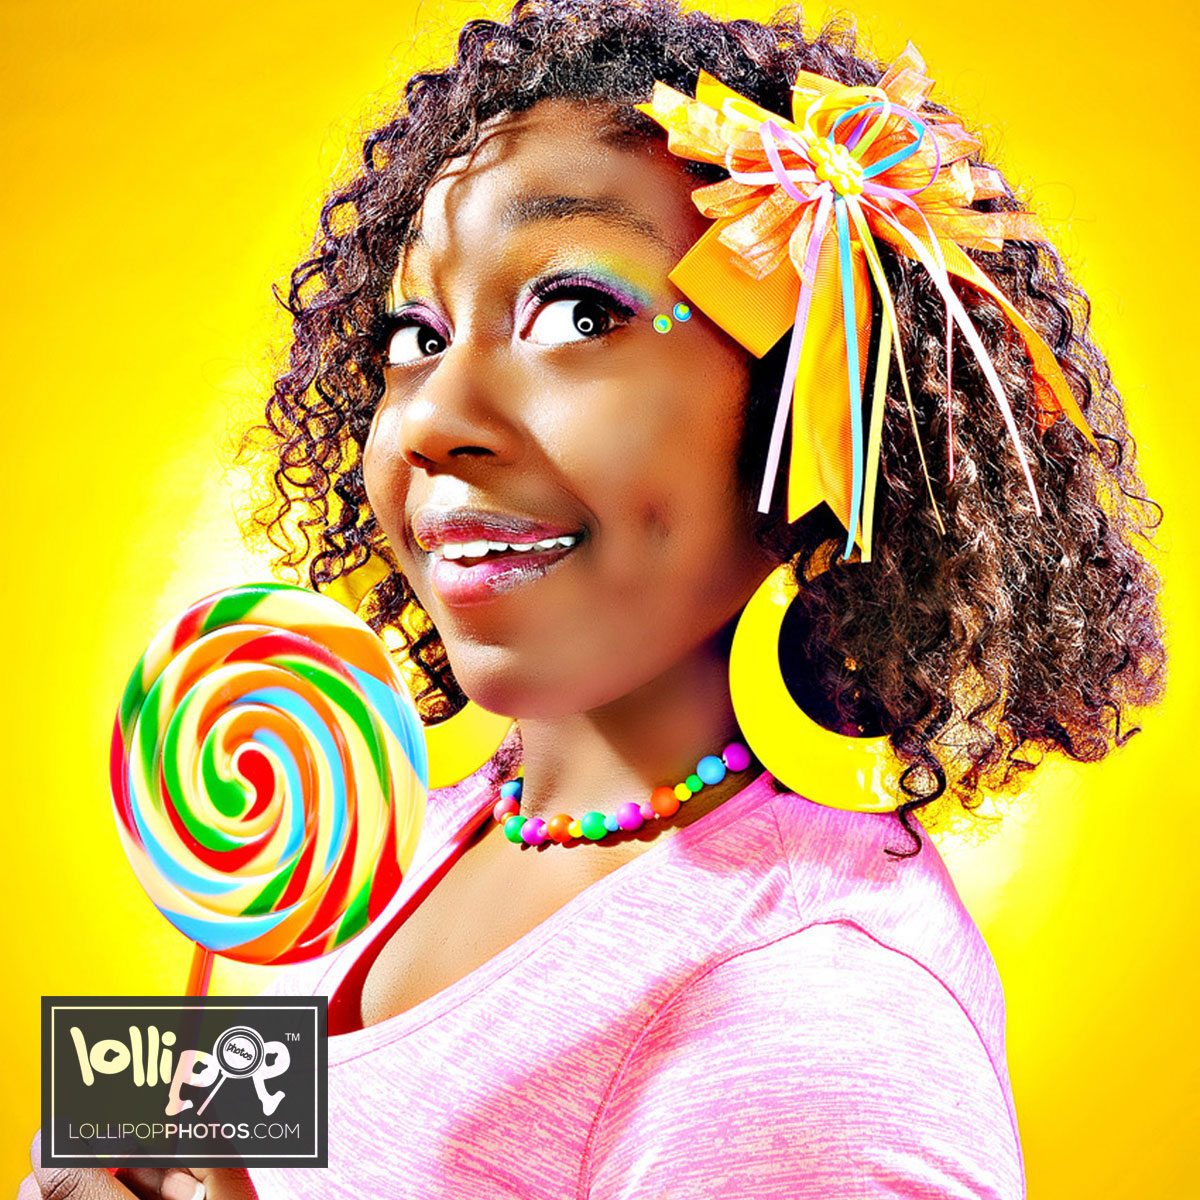 msdig-nora-canfield-lollipop-photos-373.jpg